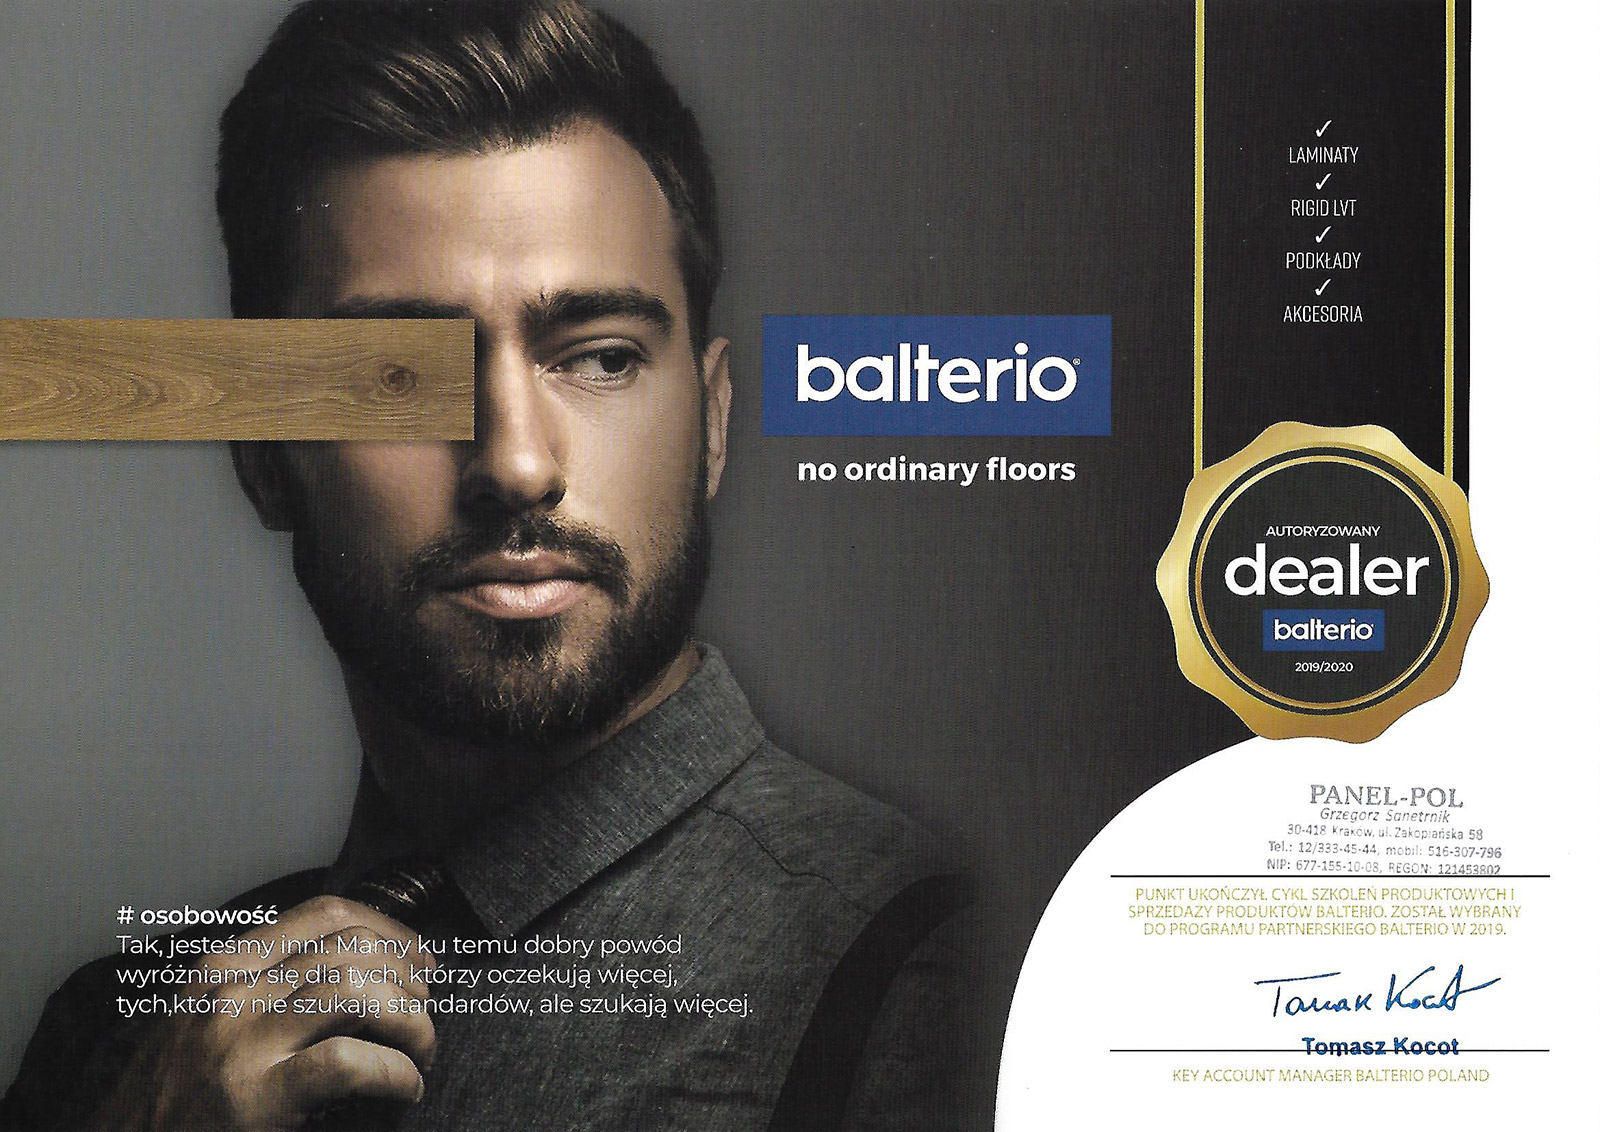 balterio-certyfikat